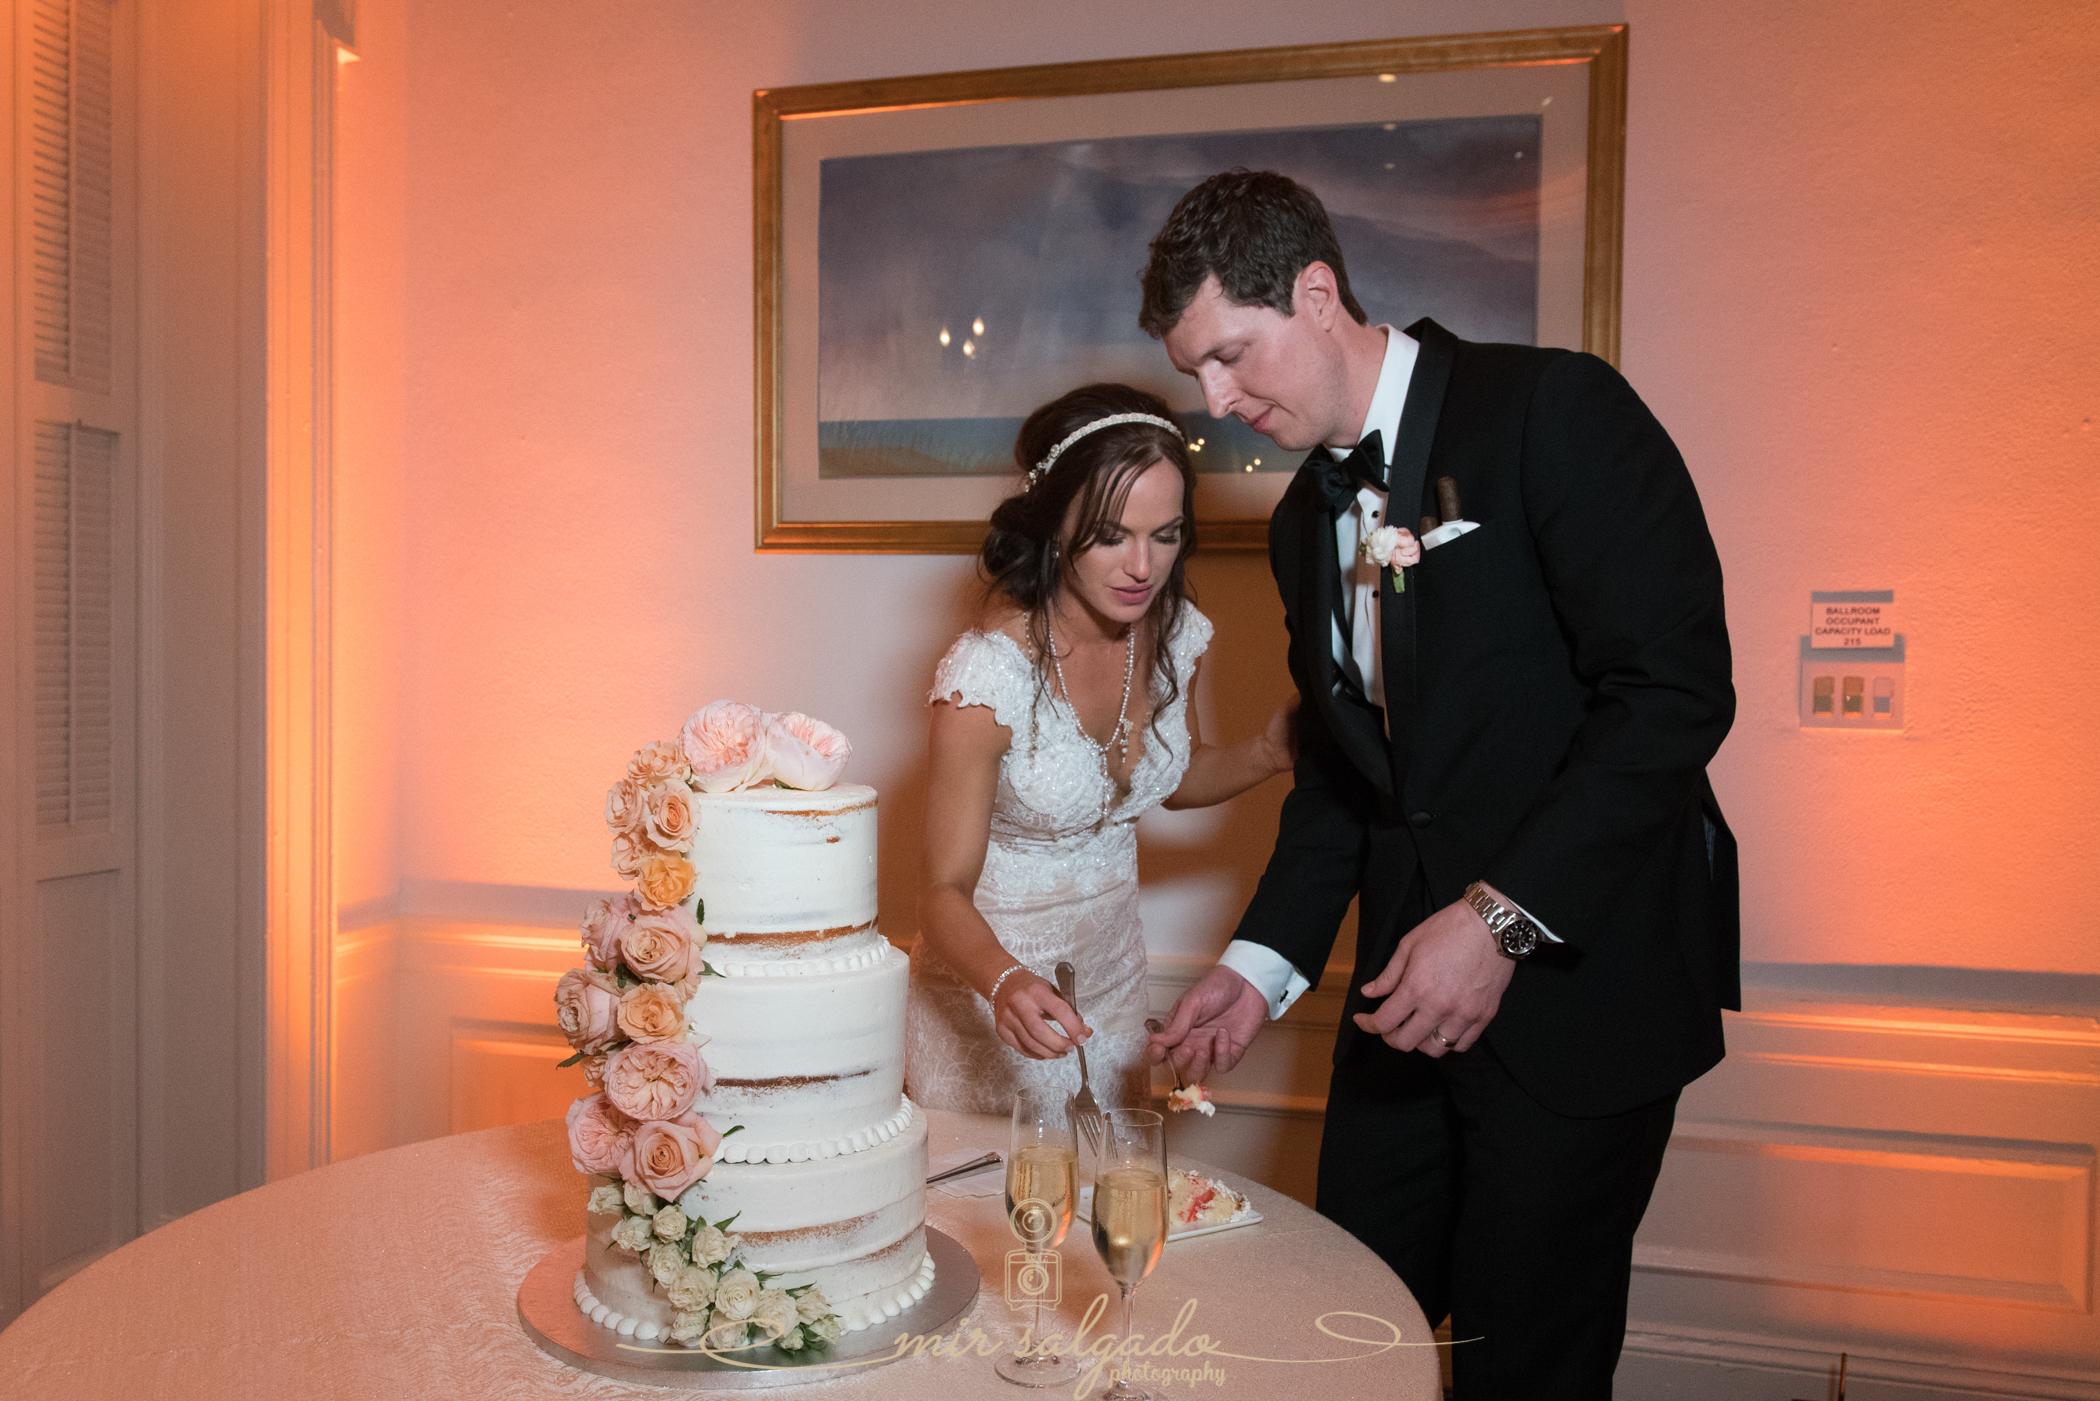 Tampa-yacht-club-wedding, cake-cutting-photo